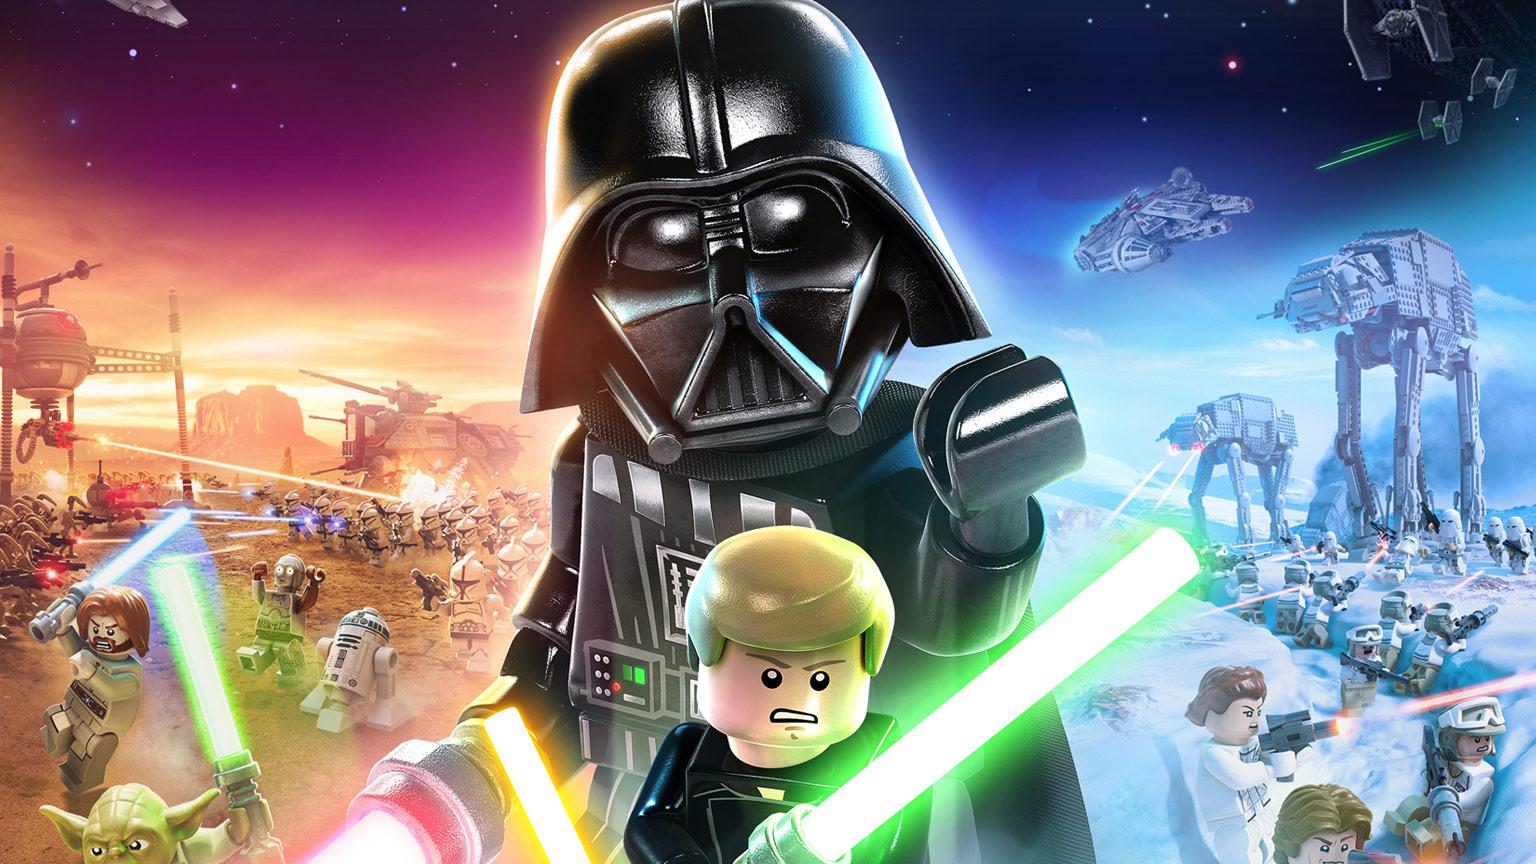 Lego Star Wars The Skywalker Saga 2612021 1